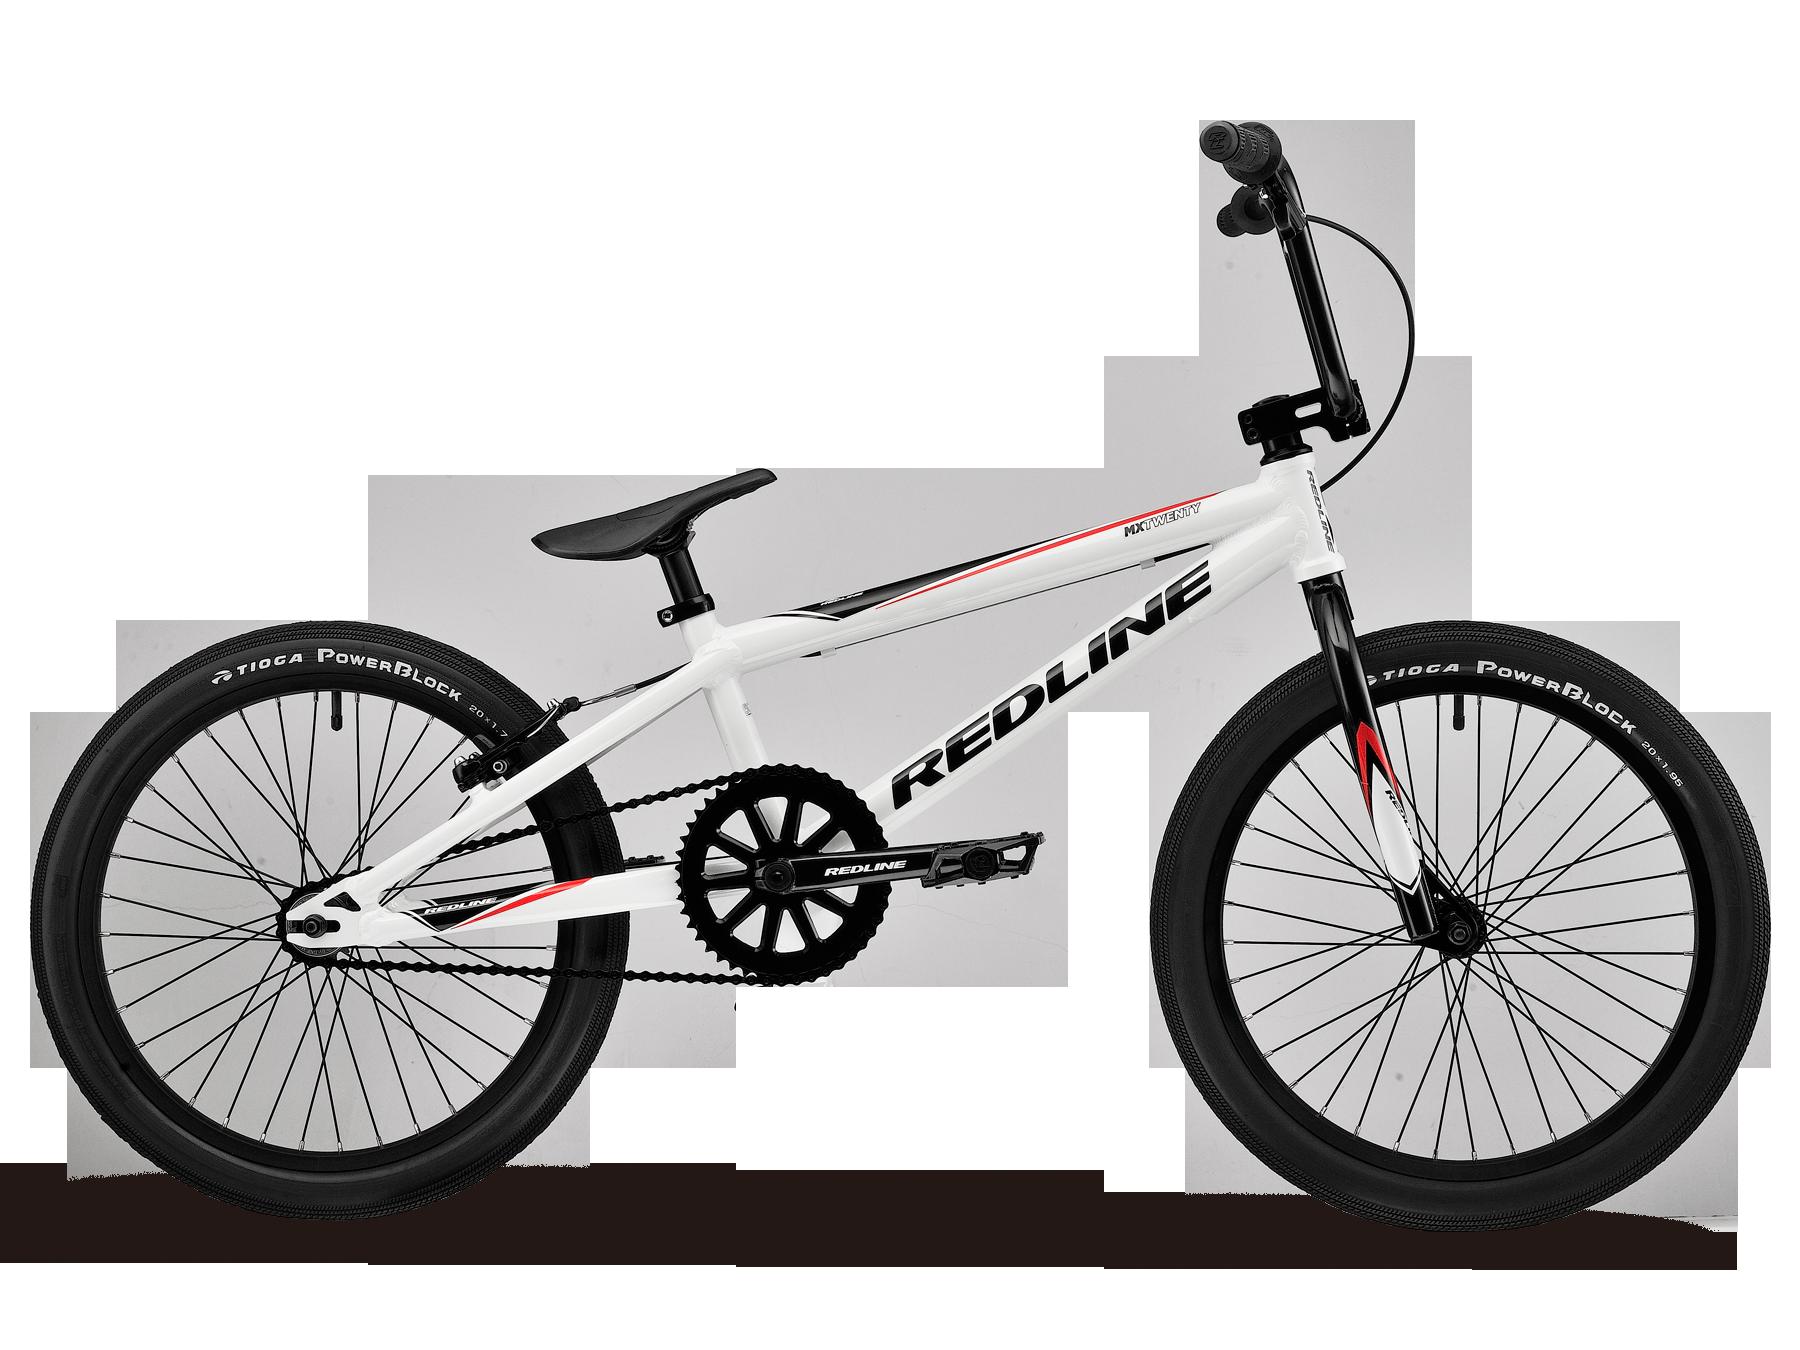 Bmx Bike Brand Started In